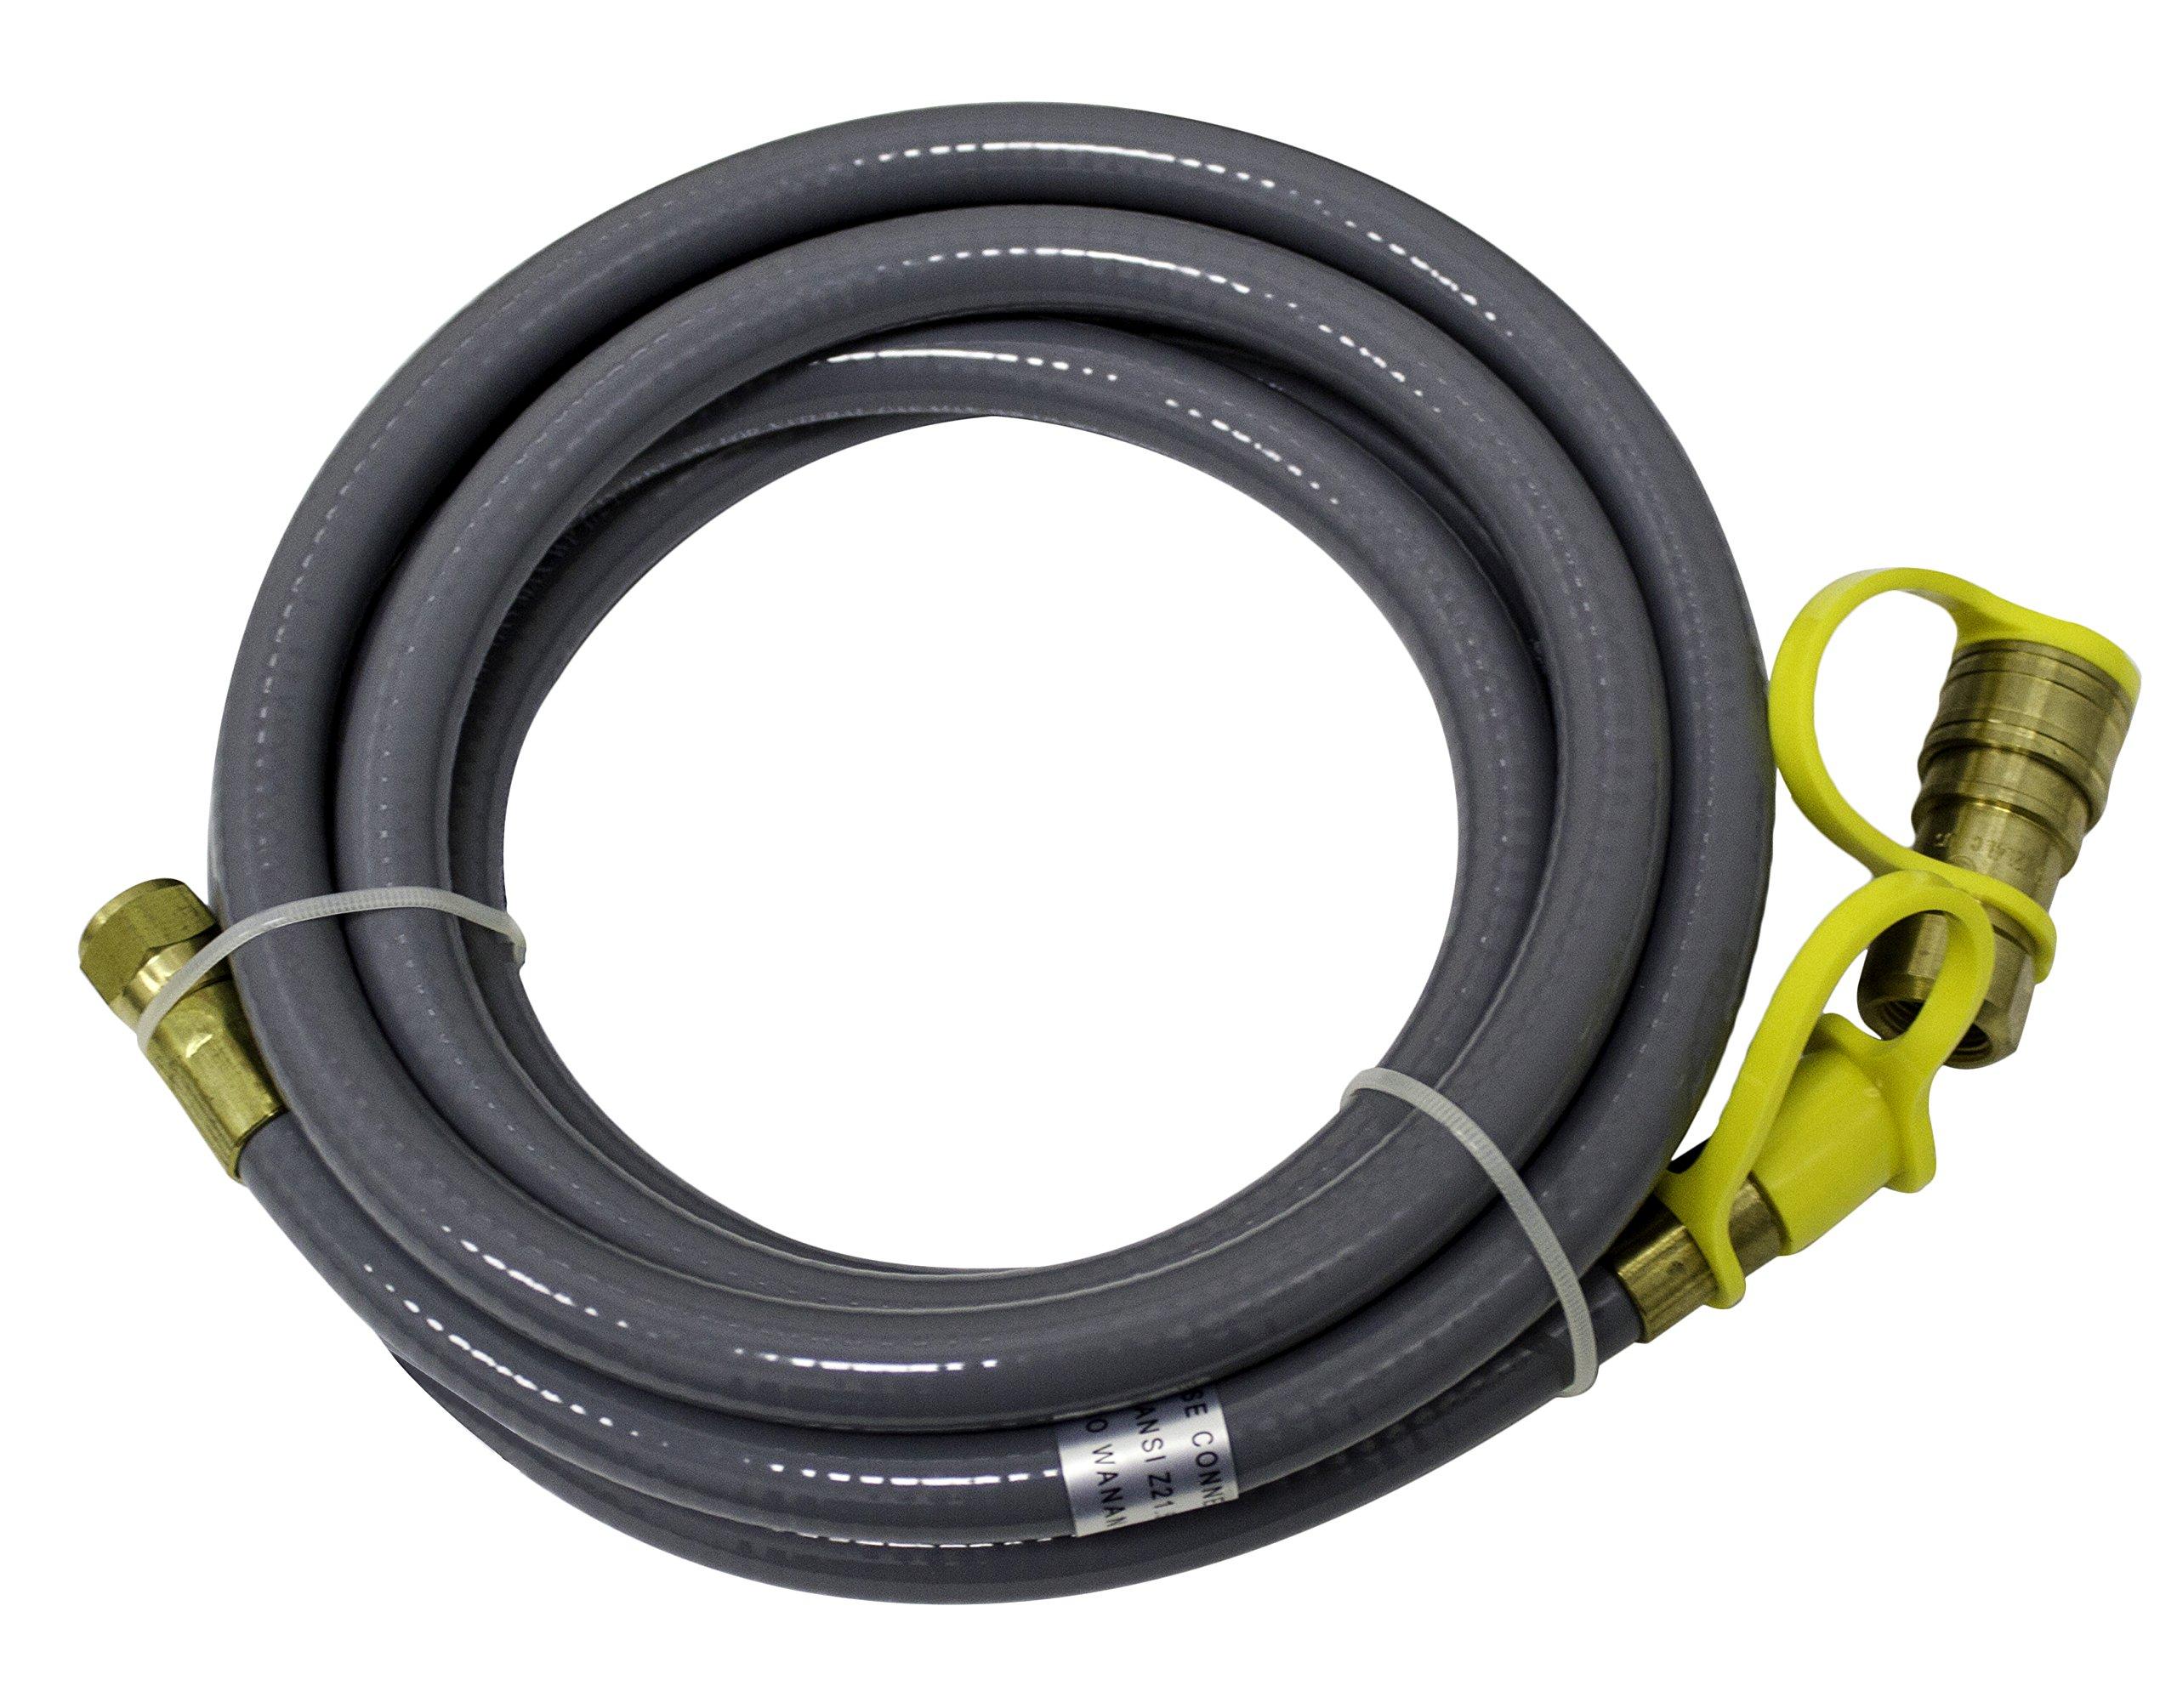 AZ Patio Heaters Natural Gas Hose, Quick Connect, 12 Feet